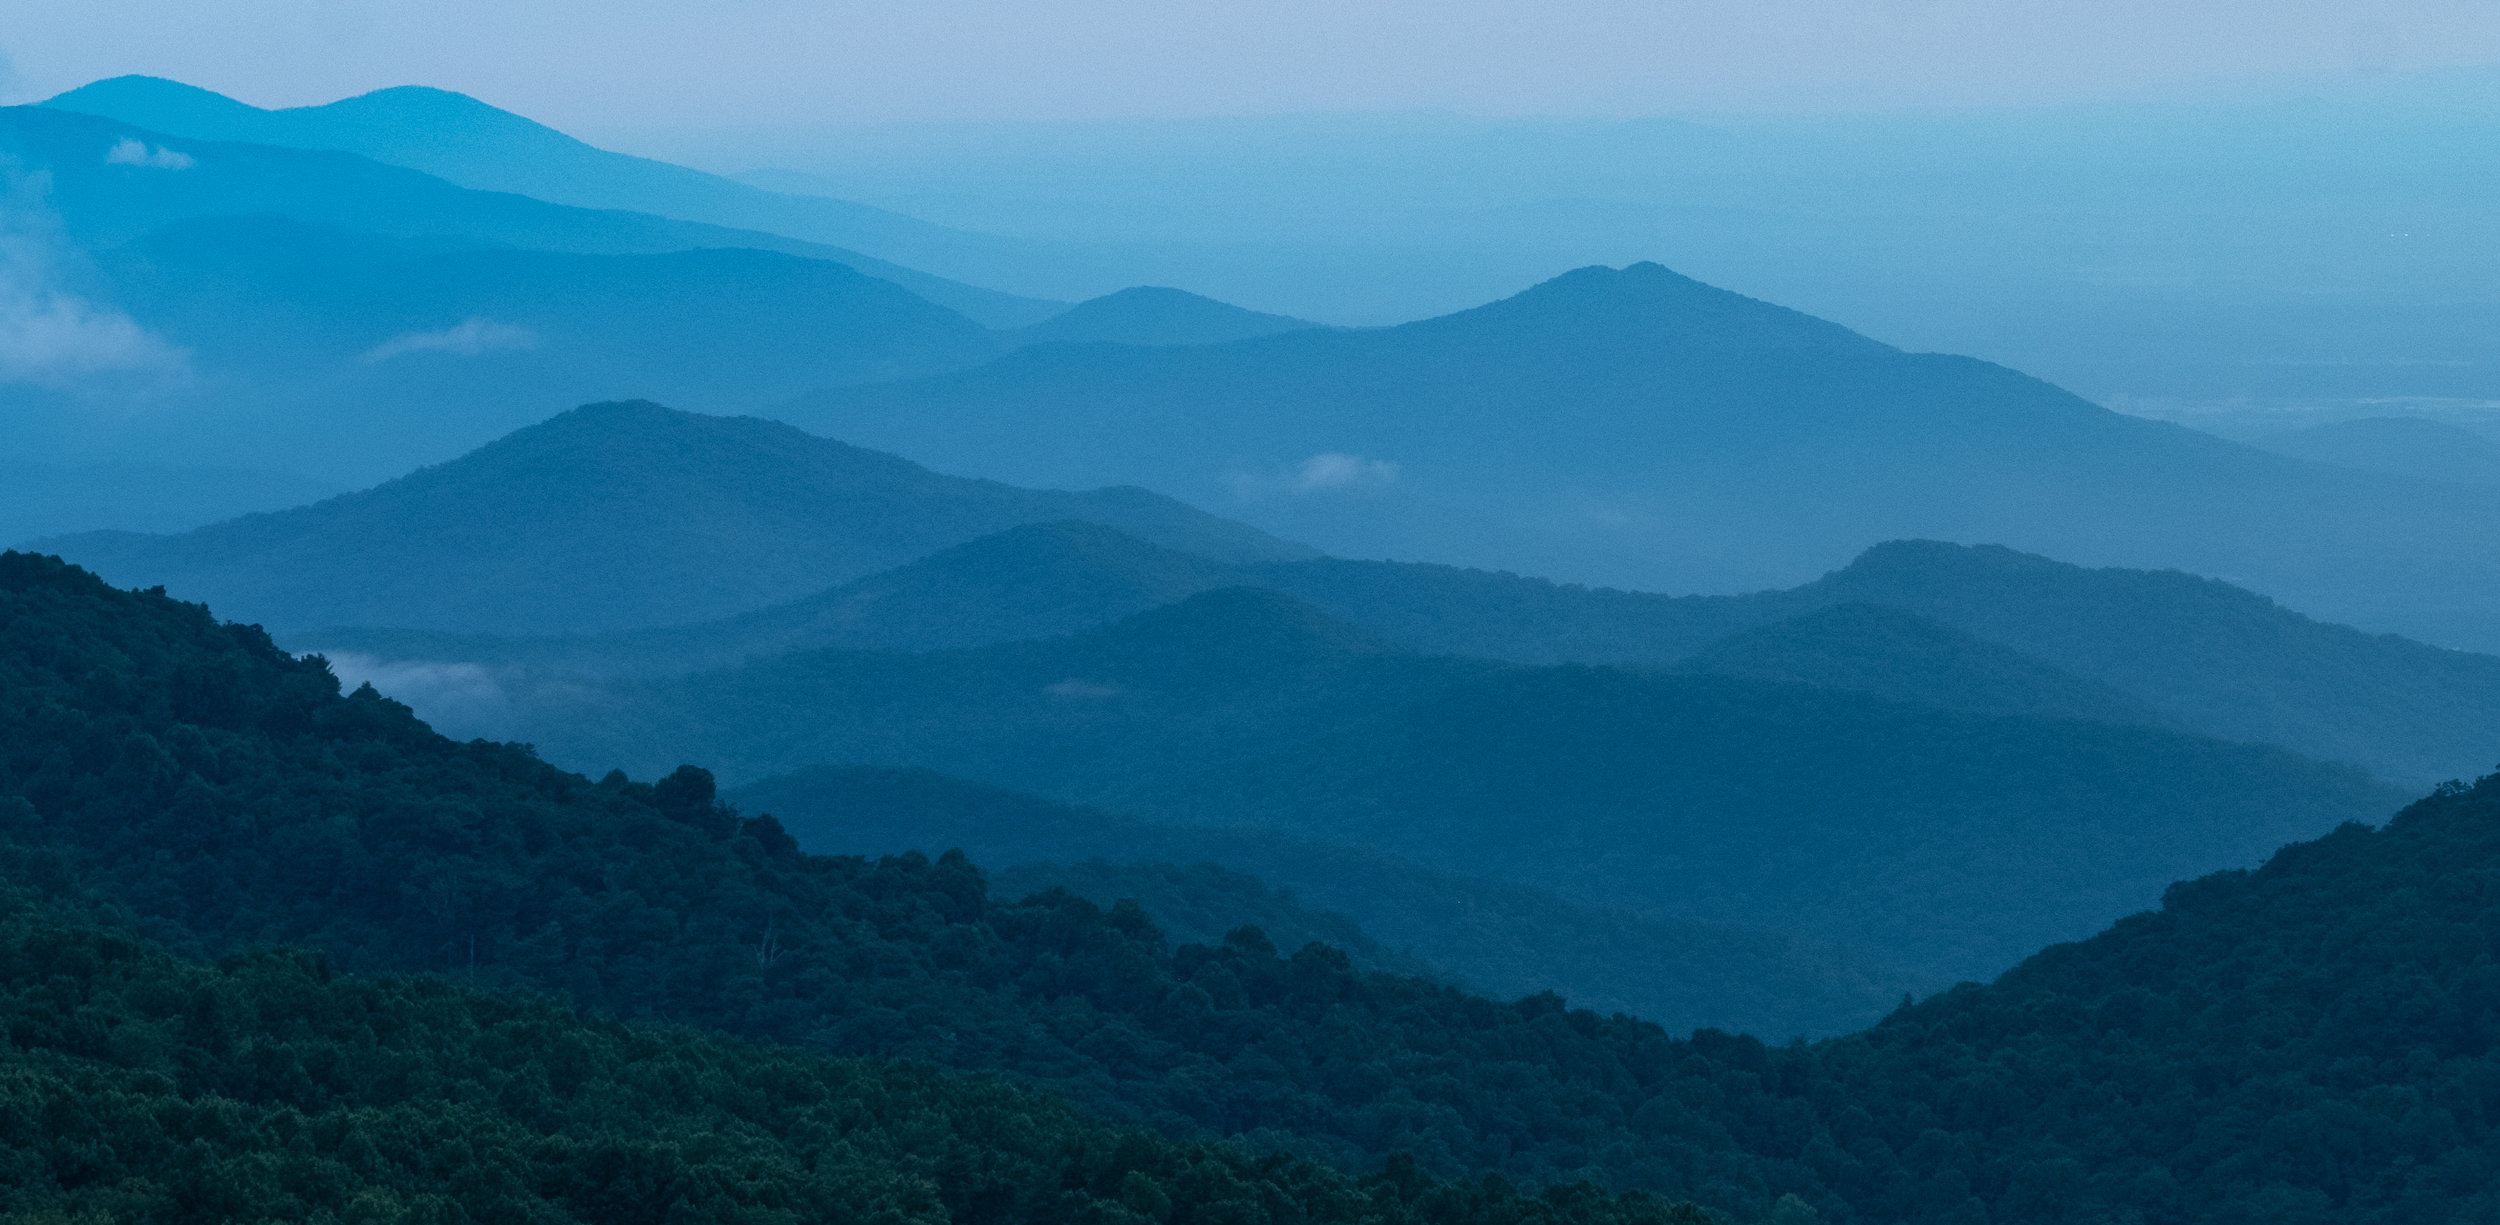 <p><strong>Shenandoah National Park</strong><br/> June 6-12, 2020</p>